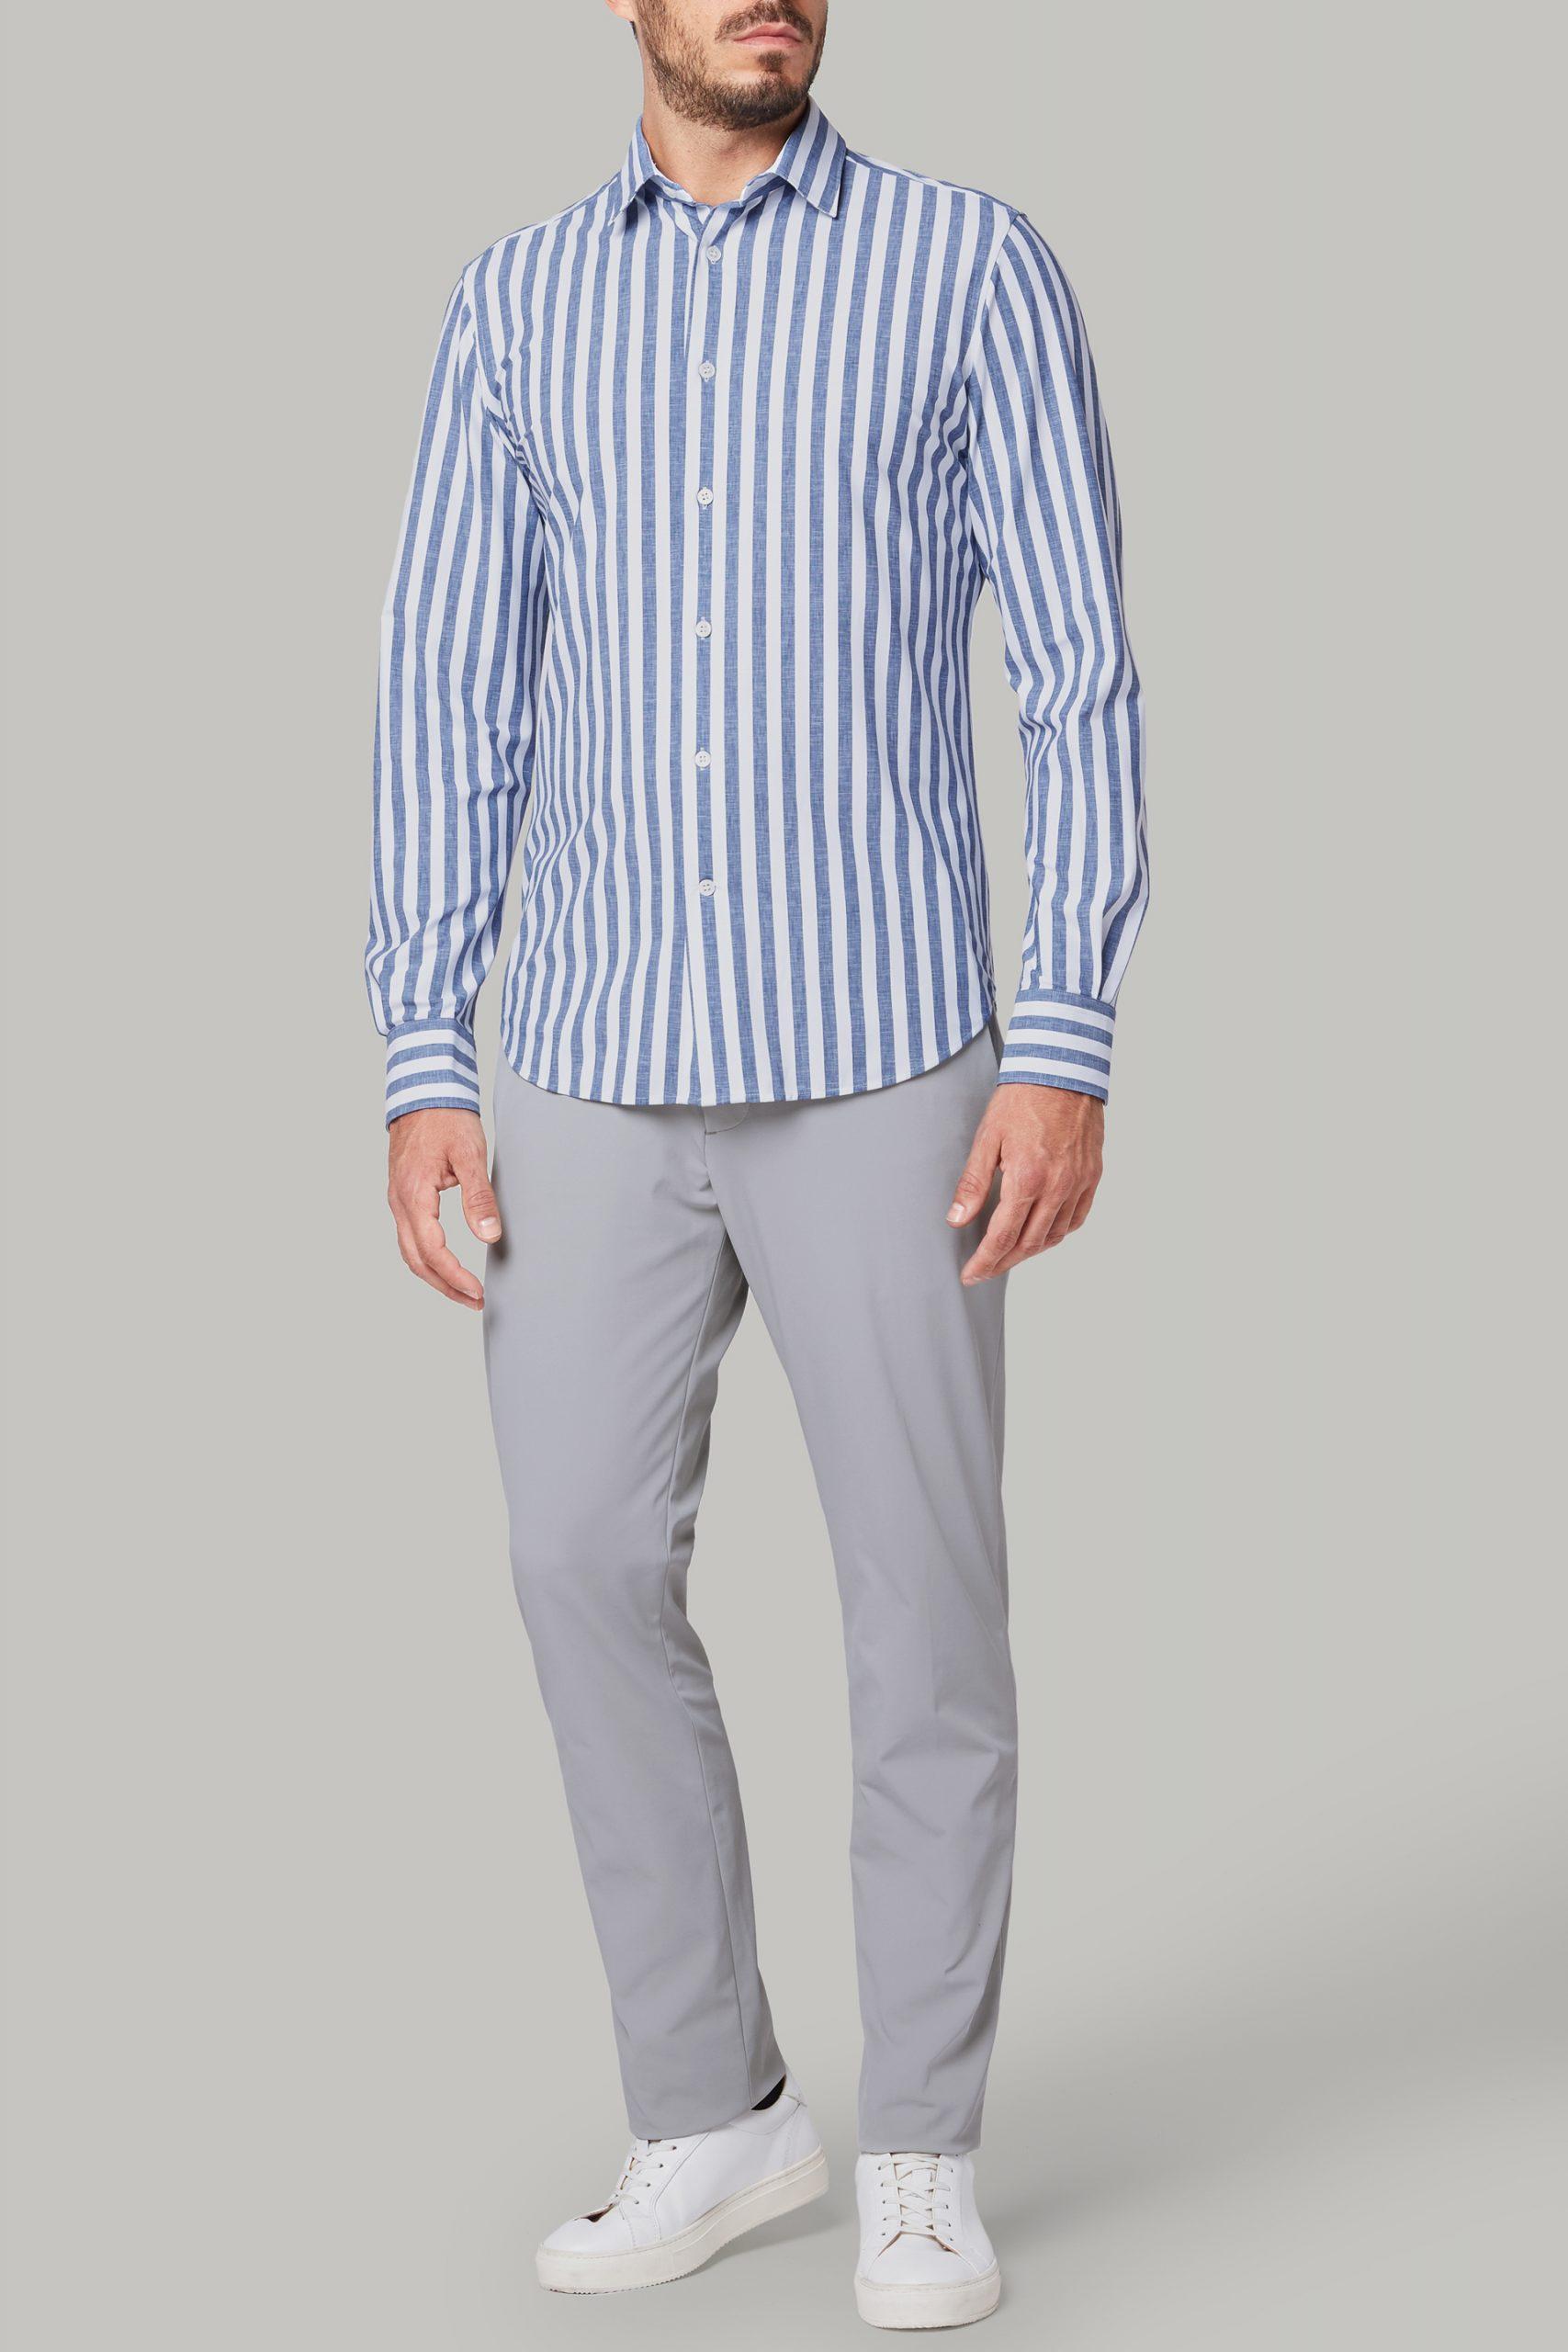 Camicie da uomo in colore Bianco Blu in materiale